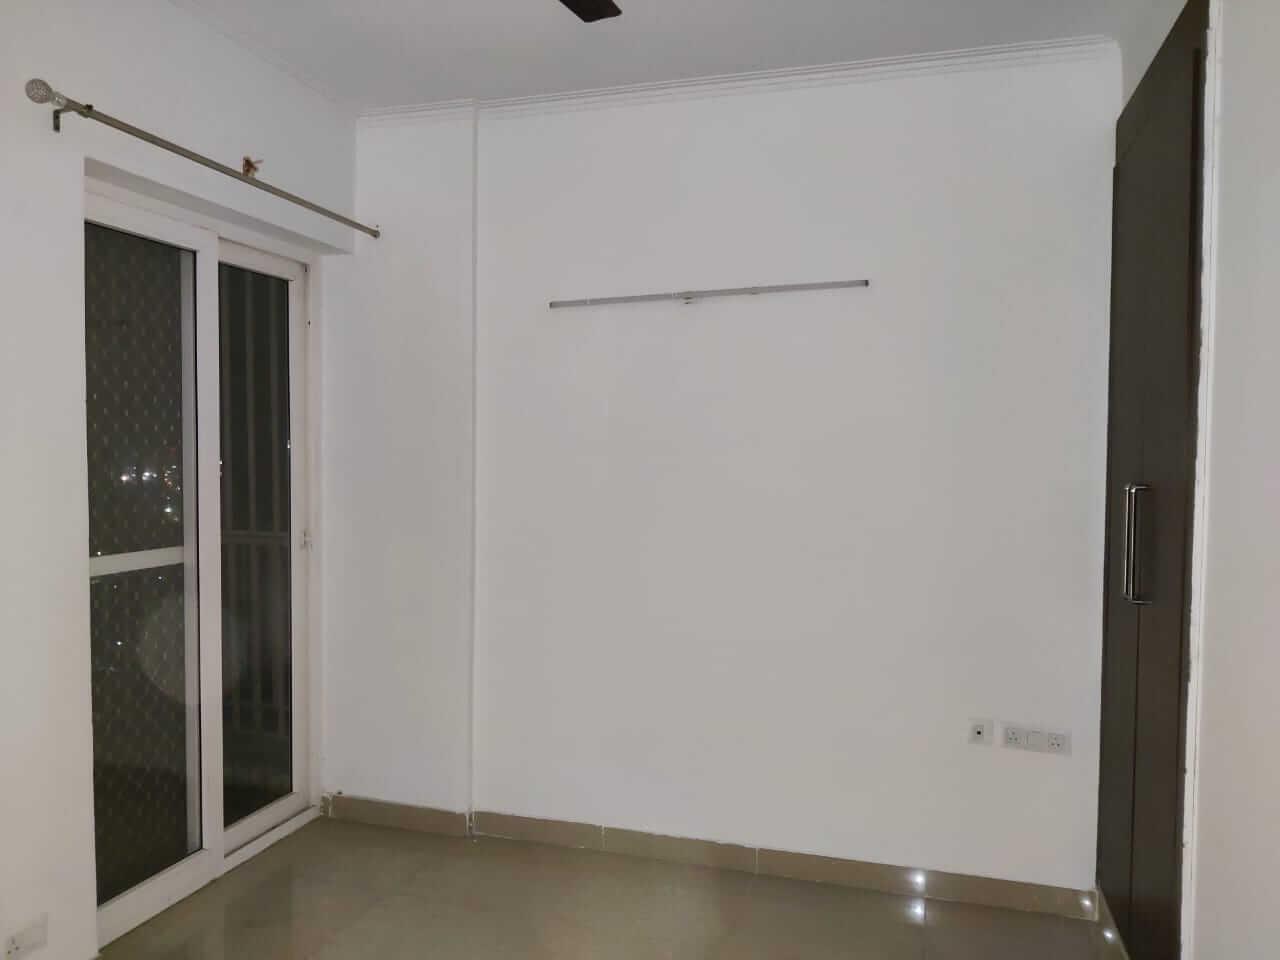 saya zionB-2206 room.jpeg